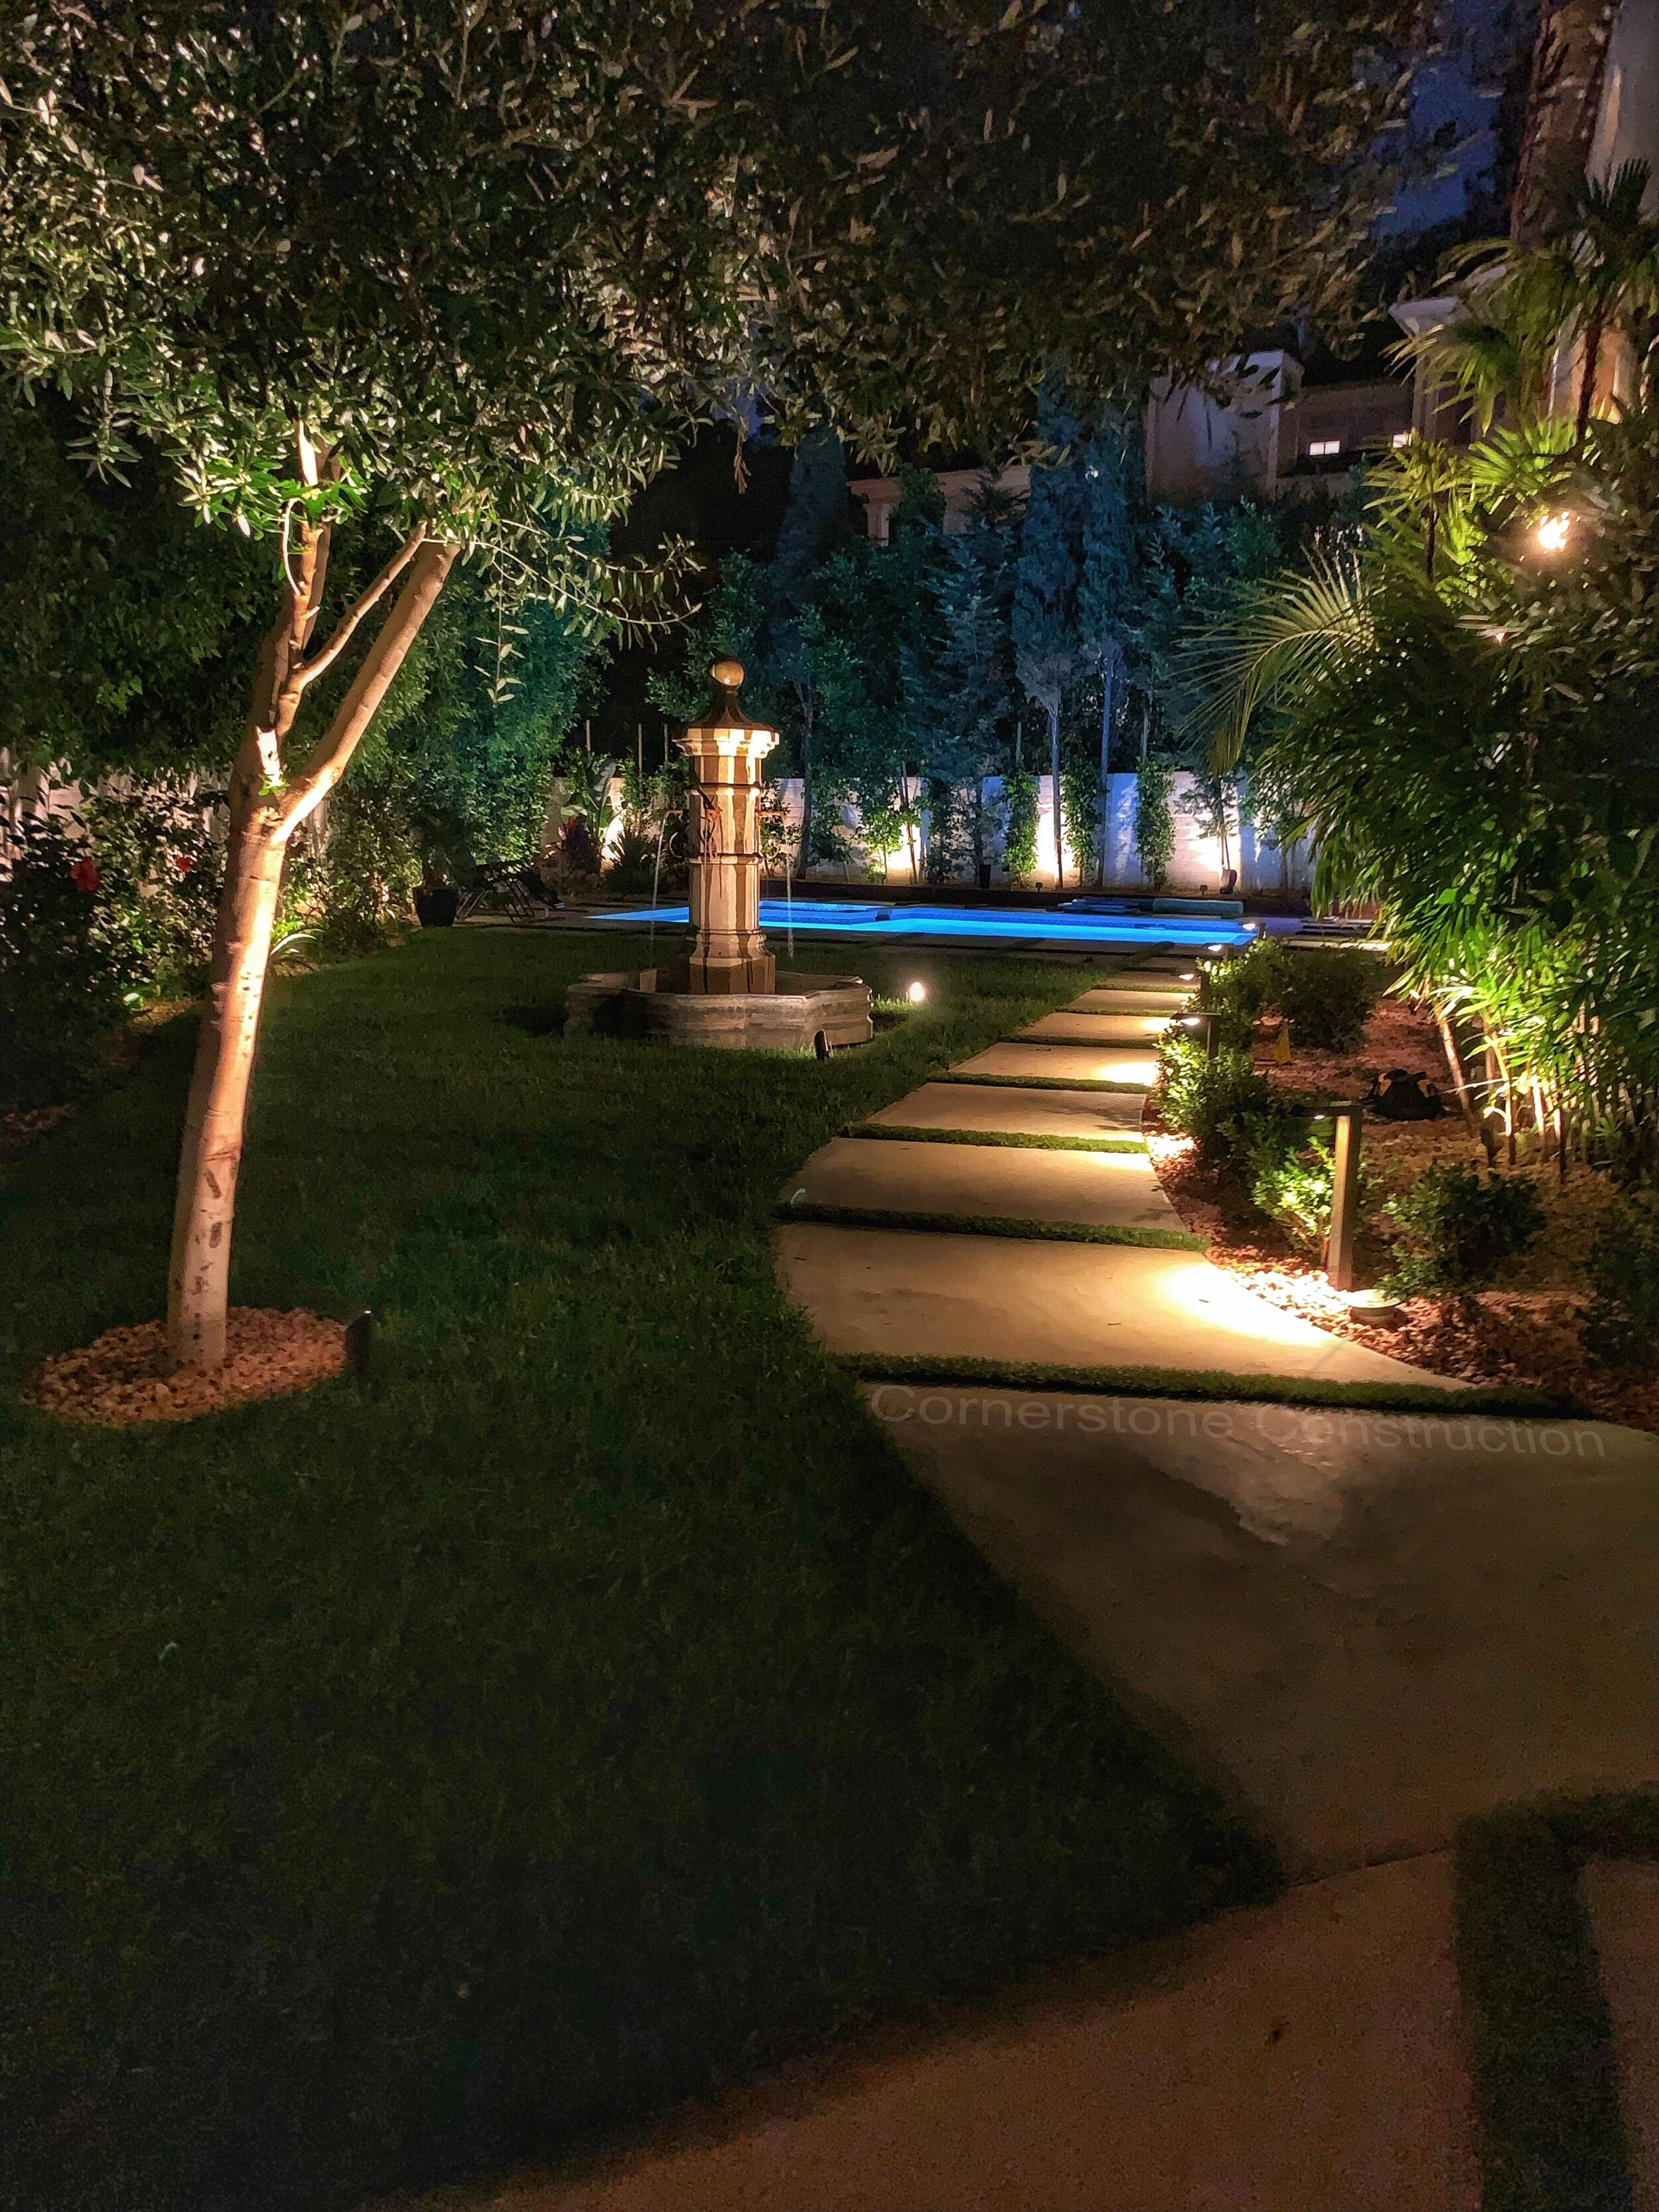 pavers and grass walkway in backyard